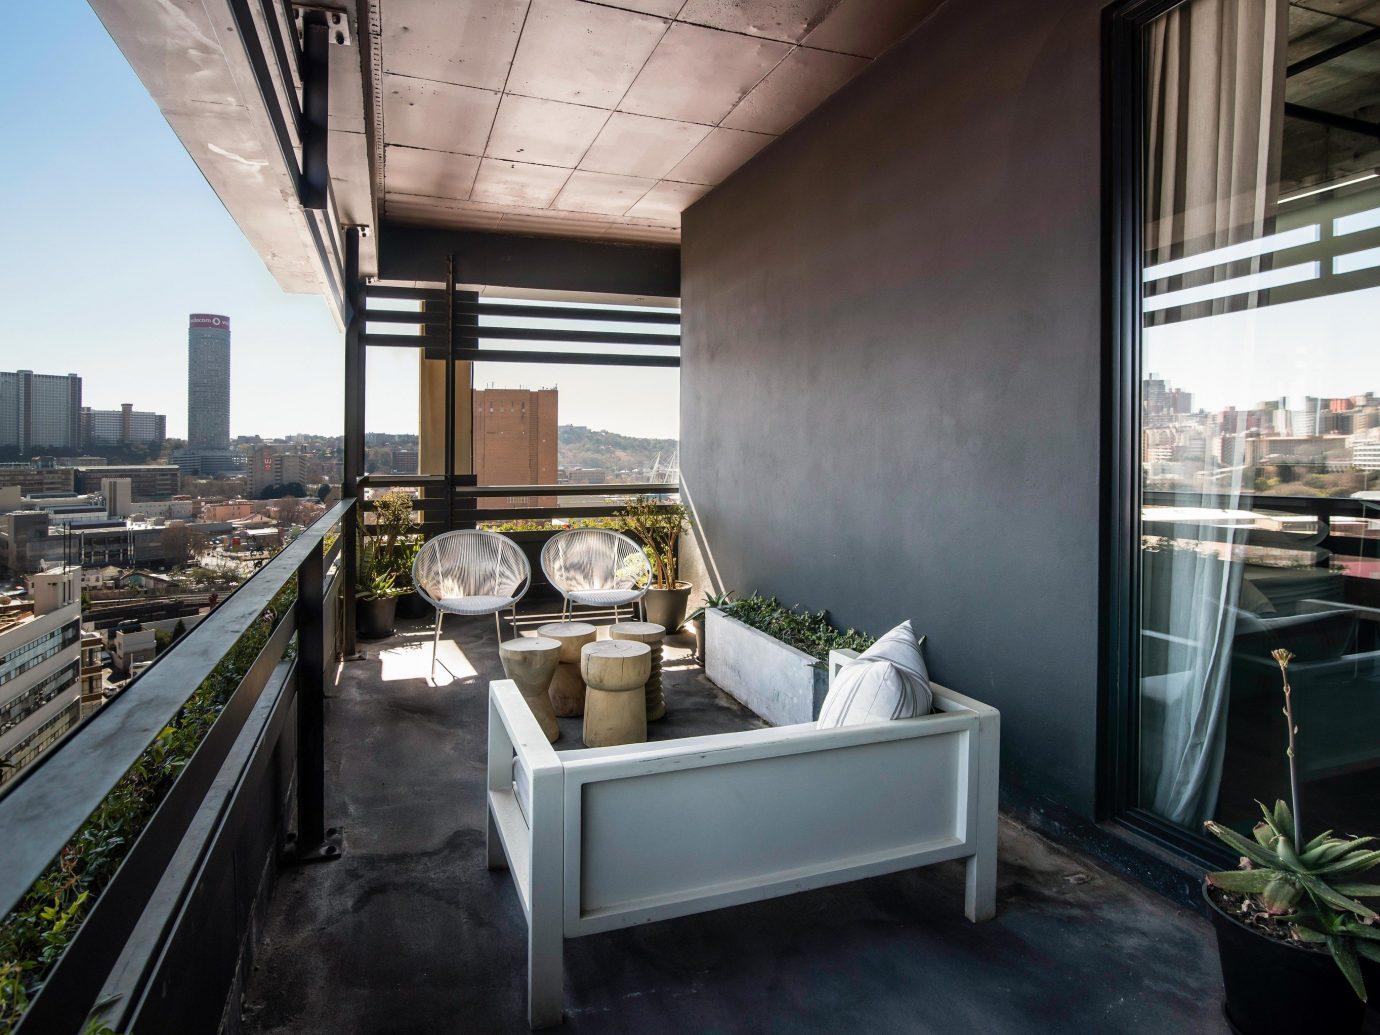 Arts + Culture Trip Ideas window Architecture real estate roof interior design apartment house Balcony loft penthouse apartment condominium daylighting furniture